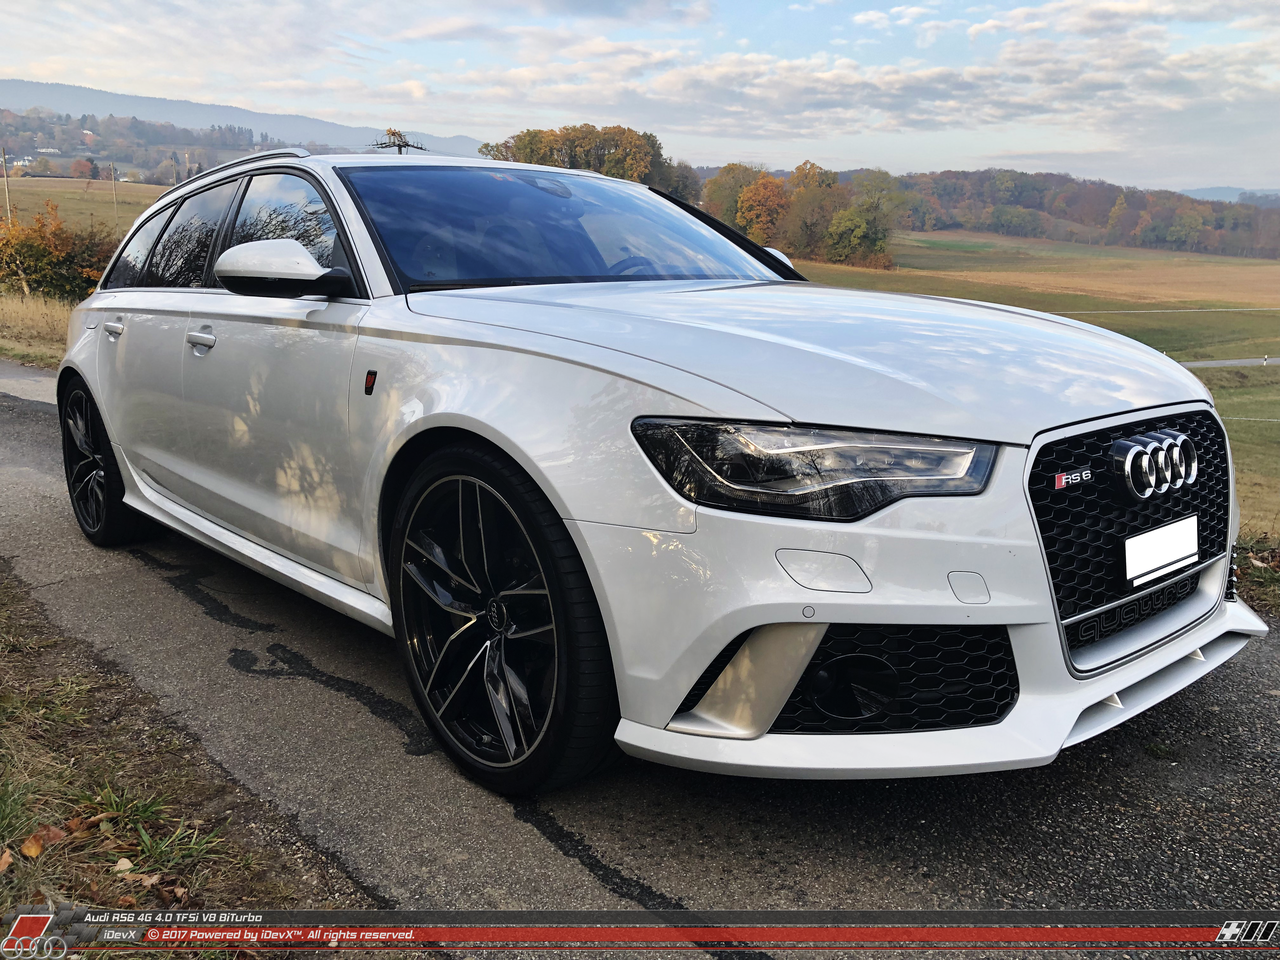 09_11.2018_Audi-RS6_iDevX_006.png